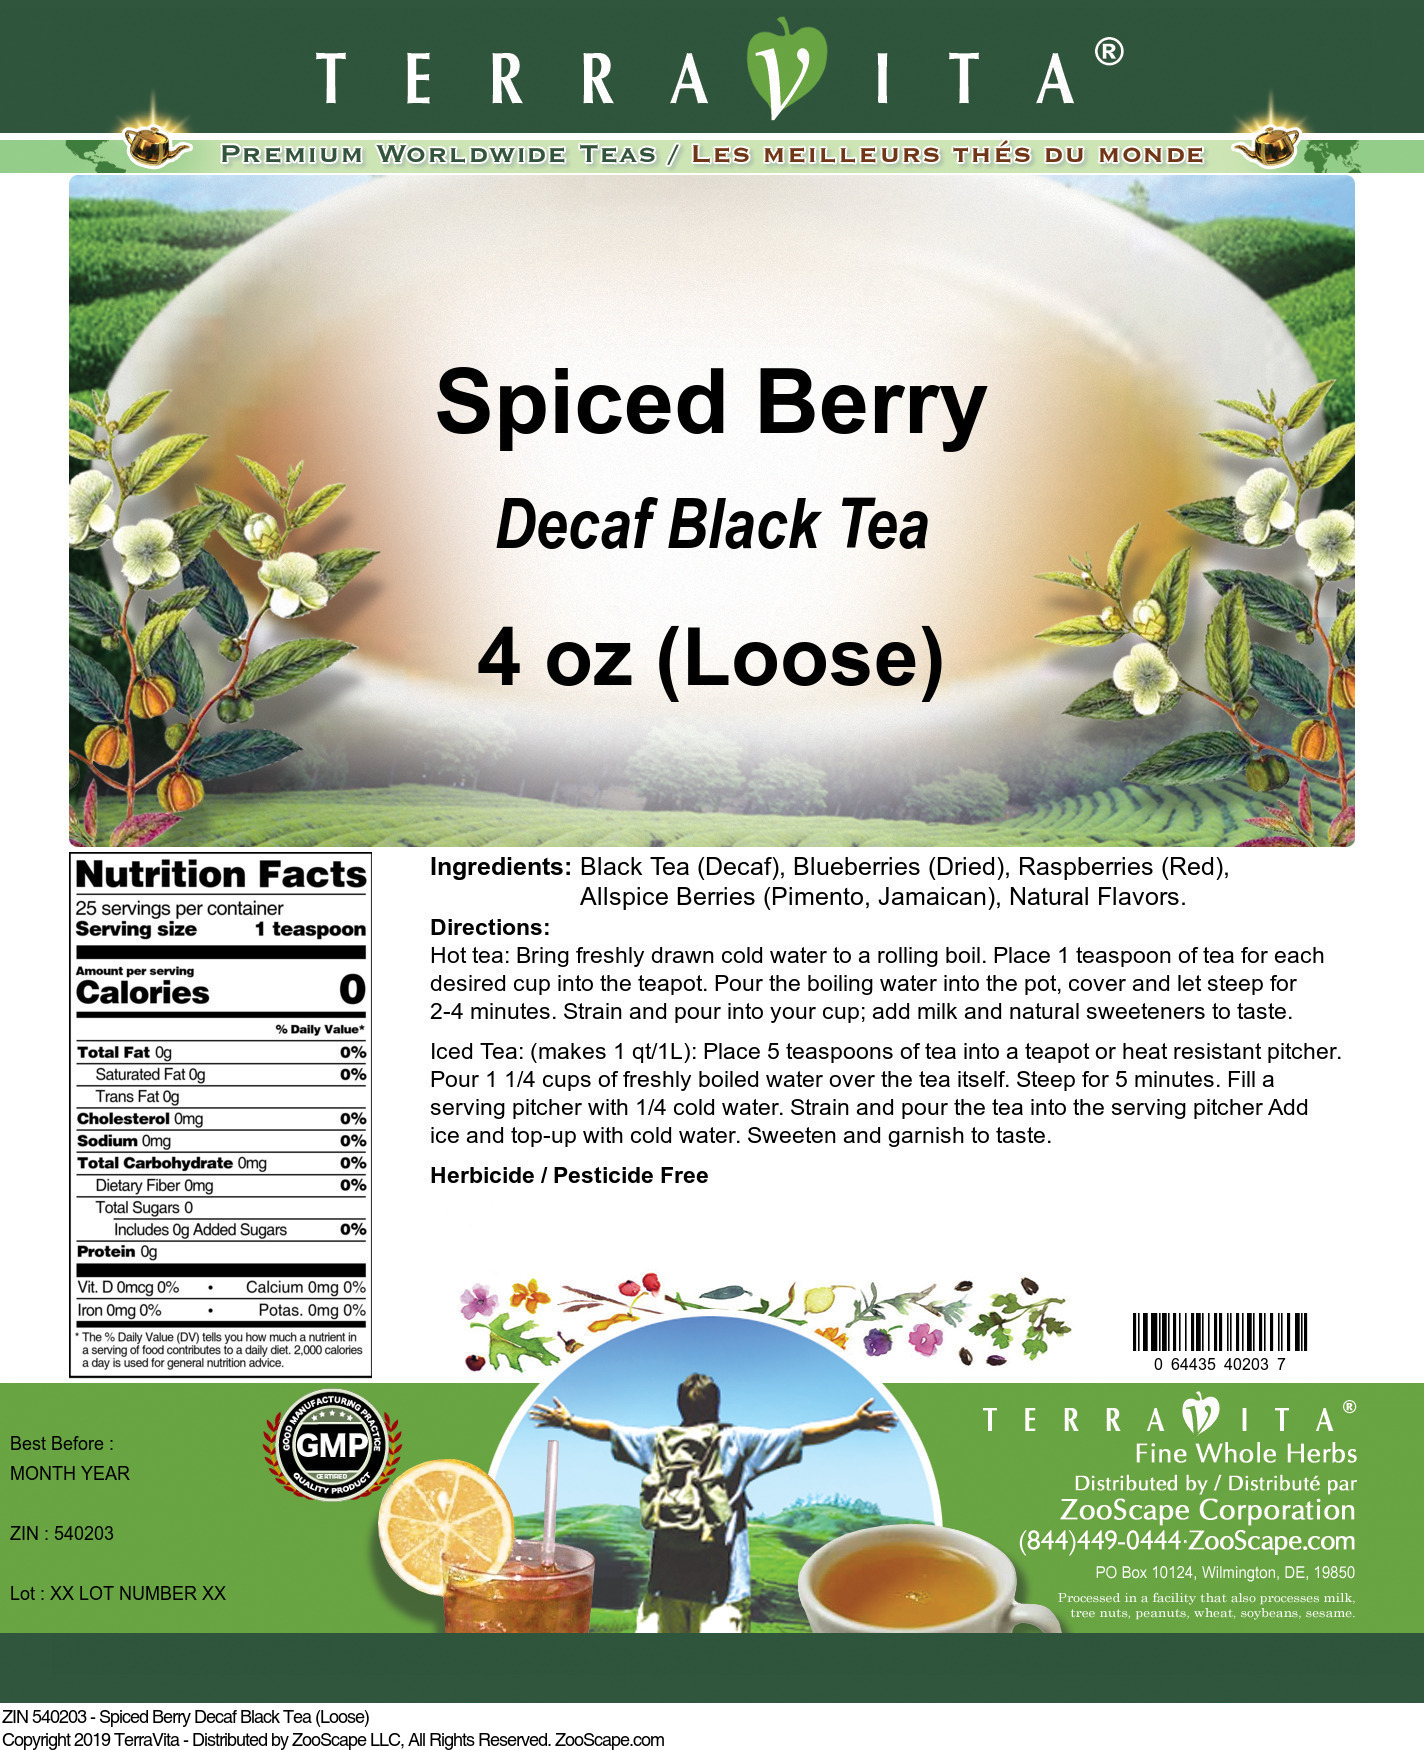 Spiced Berry Decaf Black Tea (Loose)